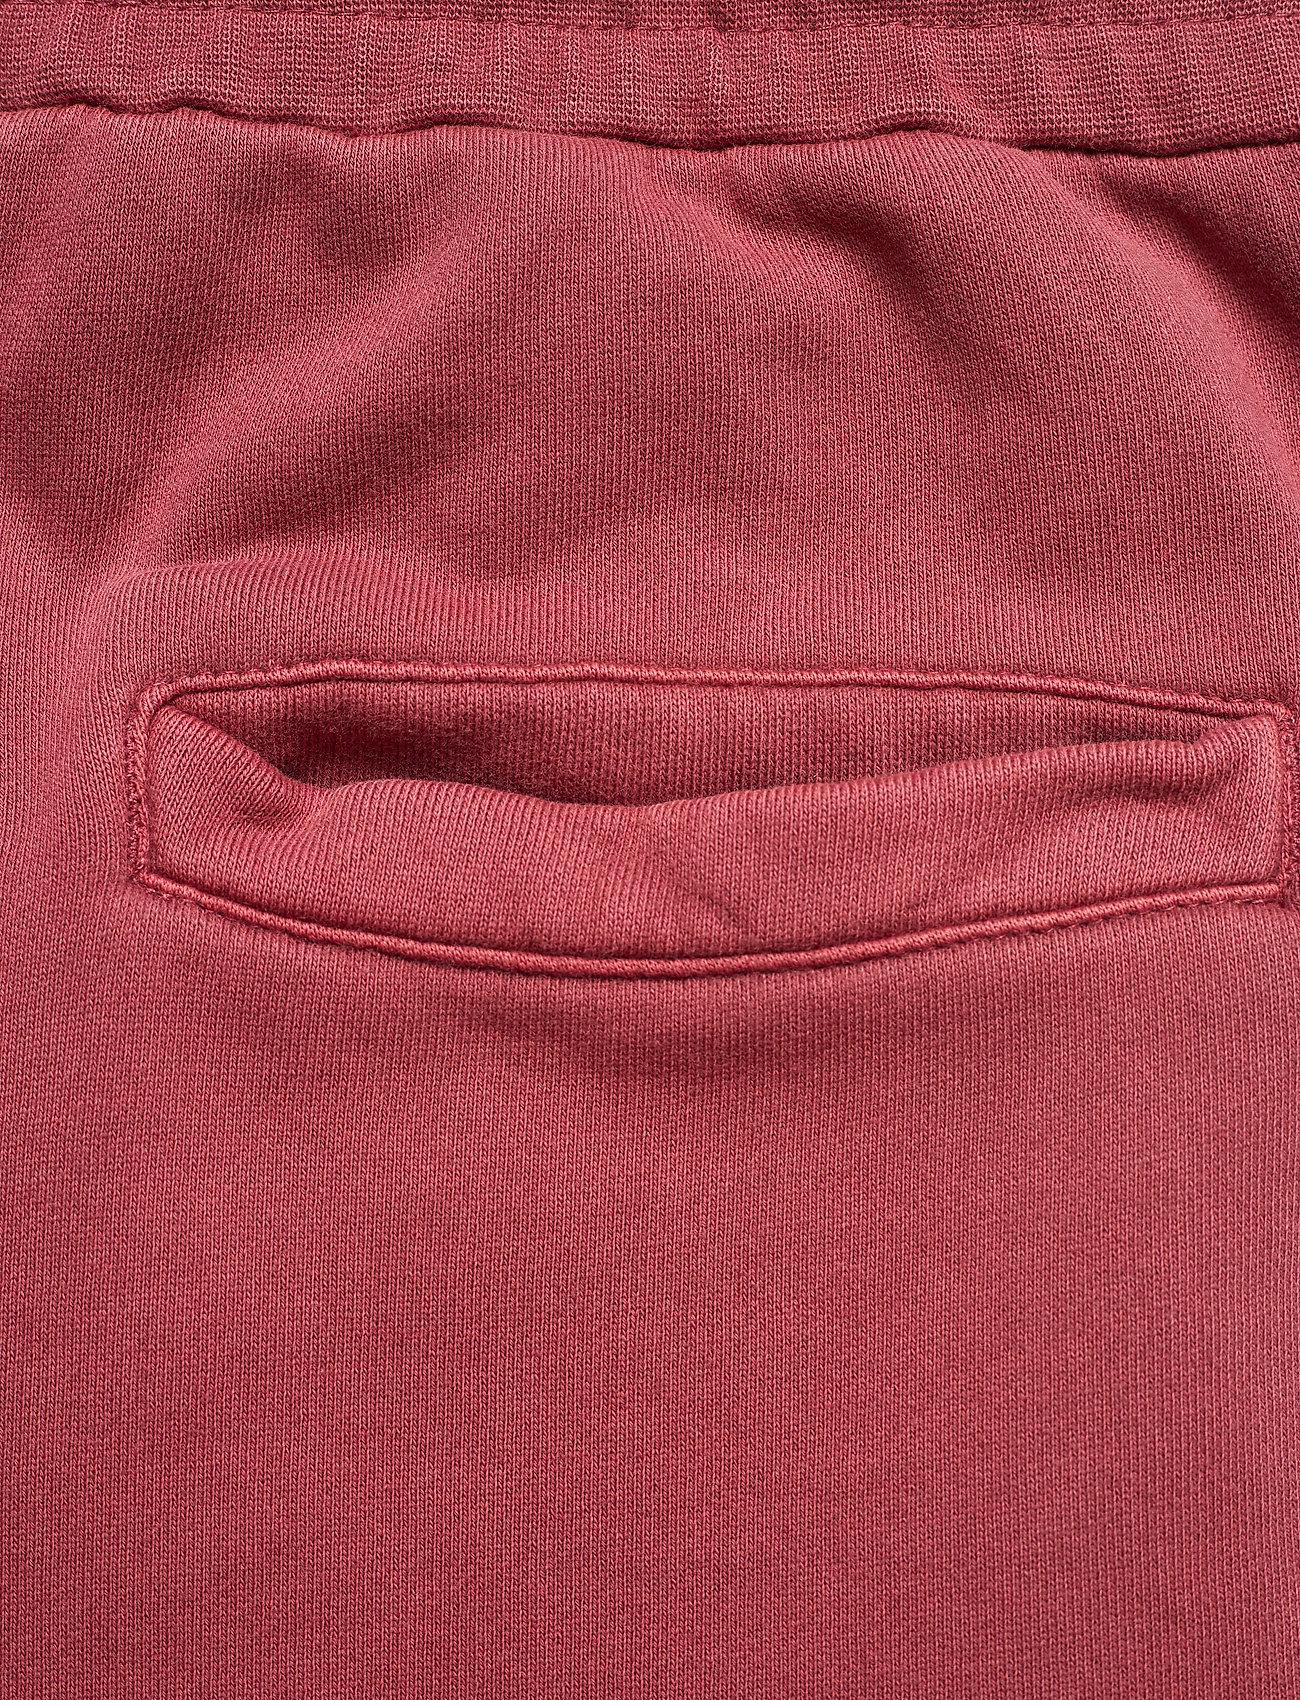 HAN Kjøbenhavn - Sweat Shorts - casual shorts - faded dark red - 7